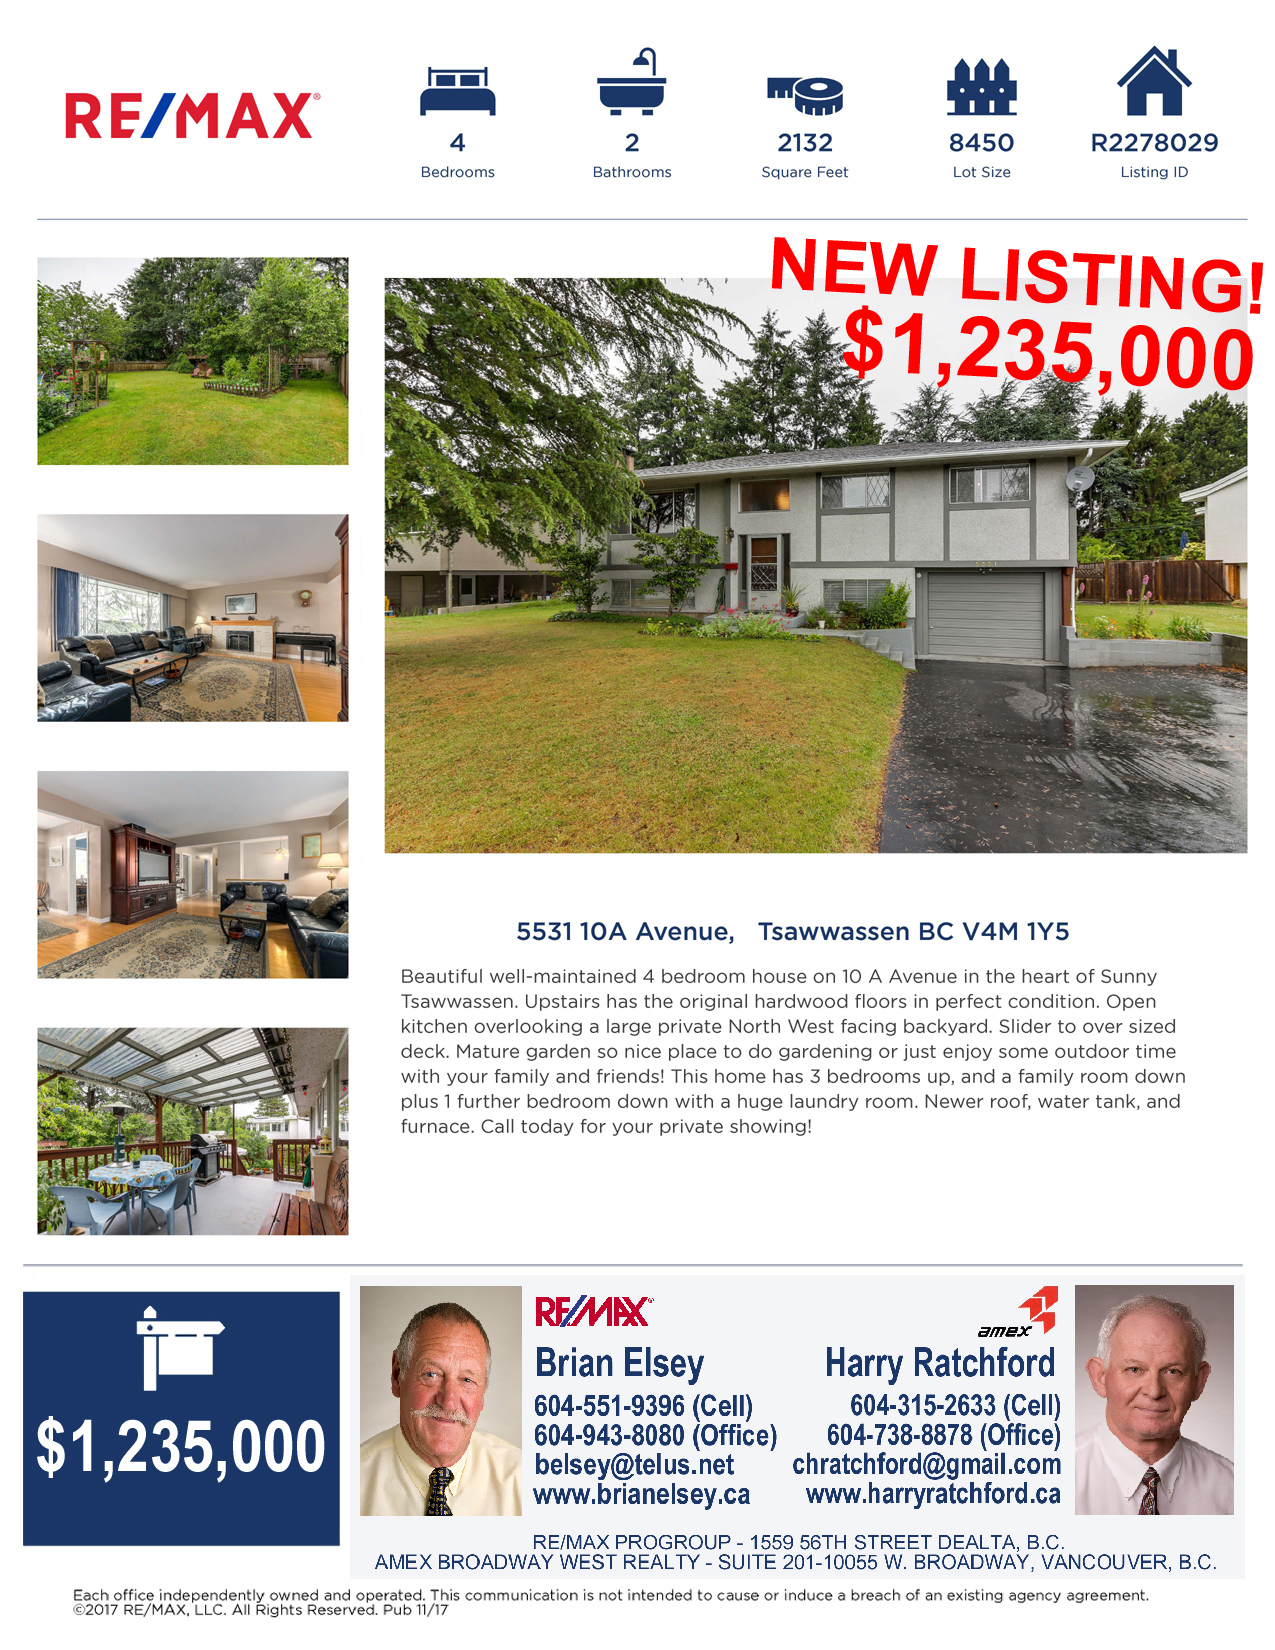 5331 10 a avenue  tsawwassen  bc v4m 1y5 2up new listing revised